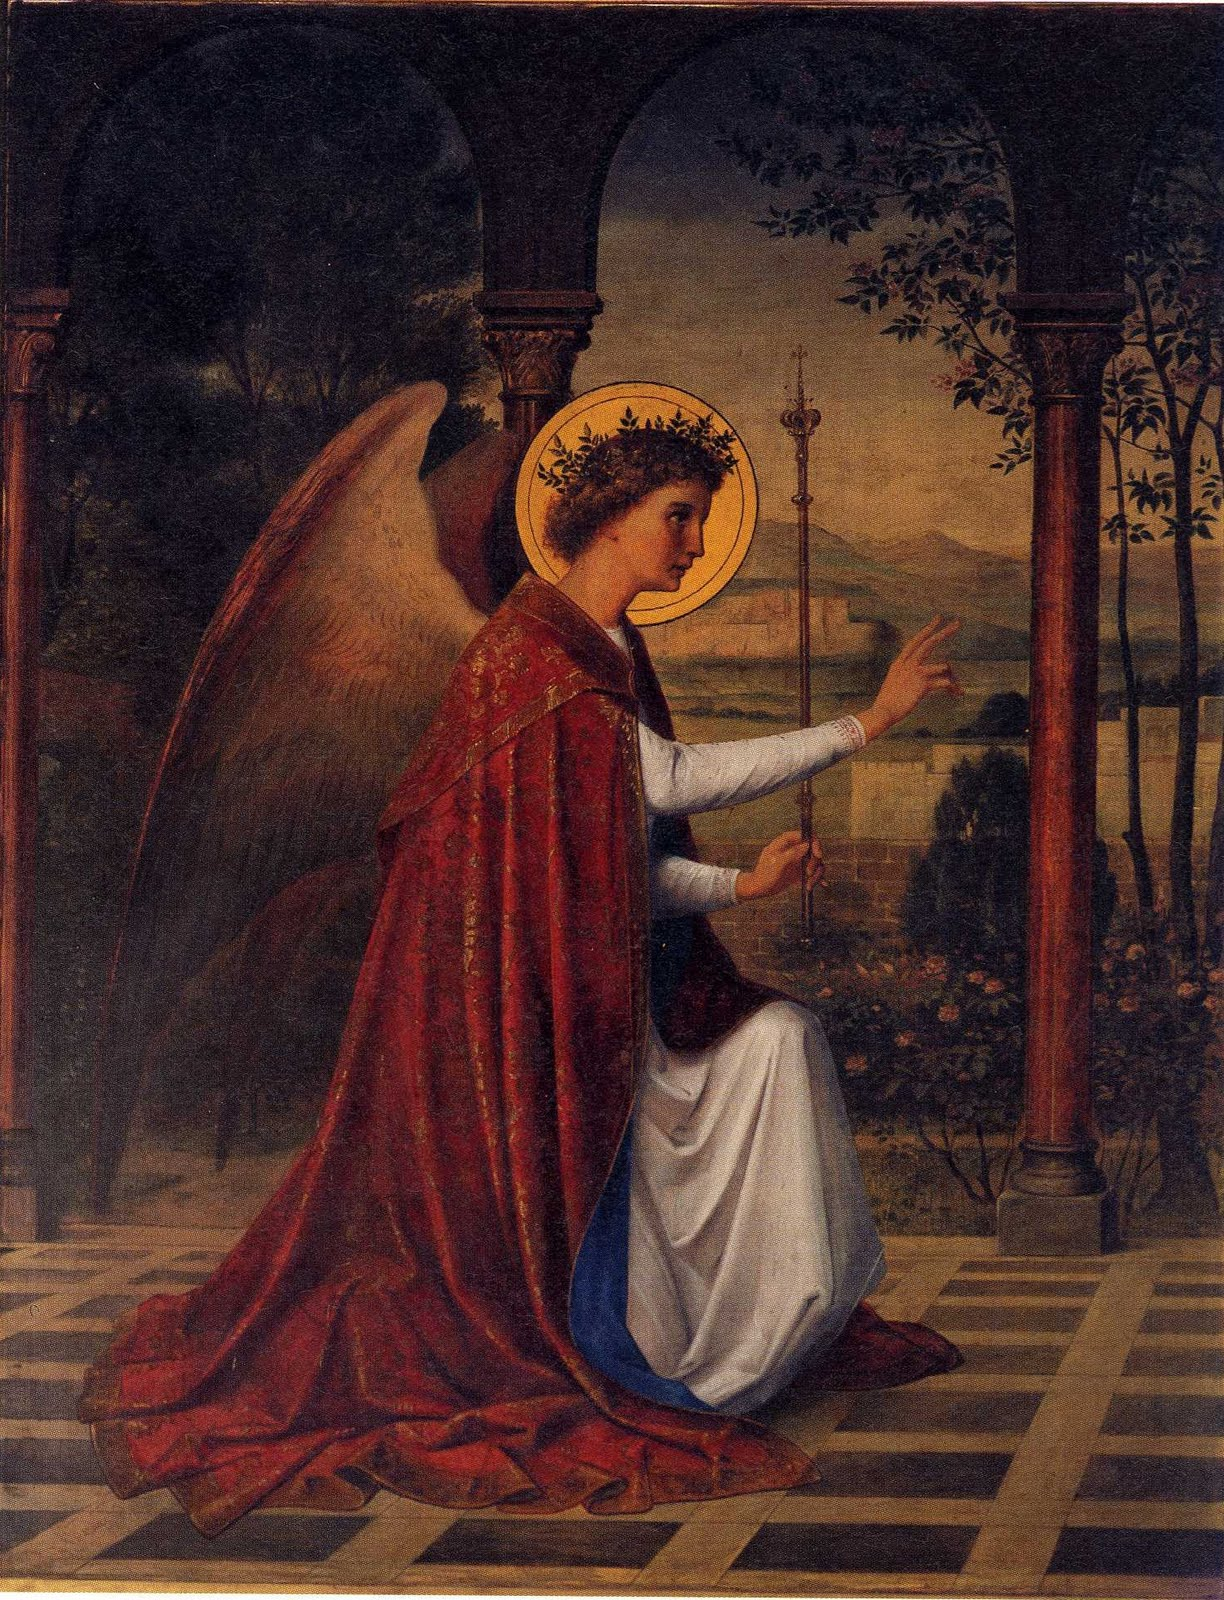 Braut des Lammes: Hll. Michael, Gabriel und Raphael, Erzengel